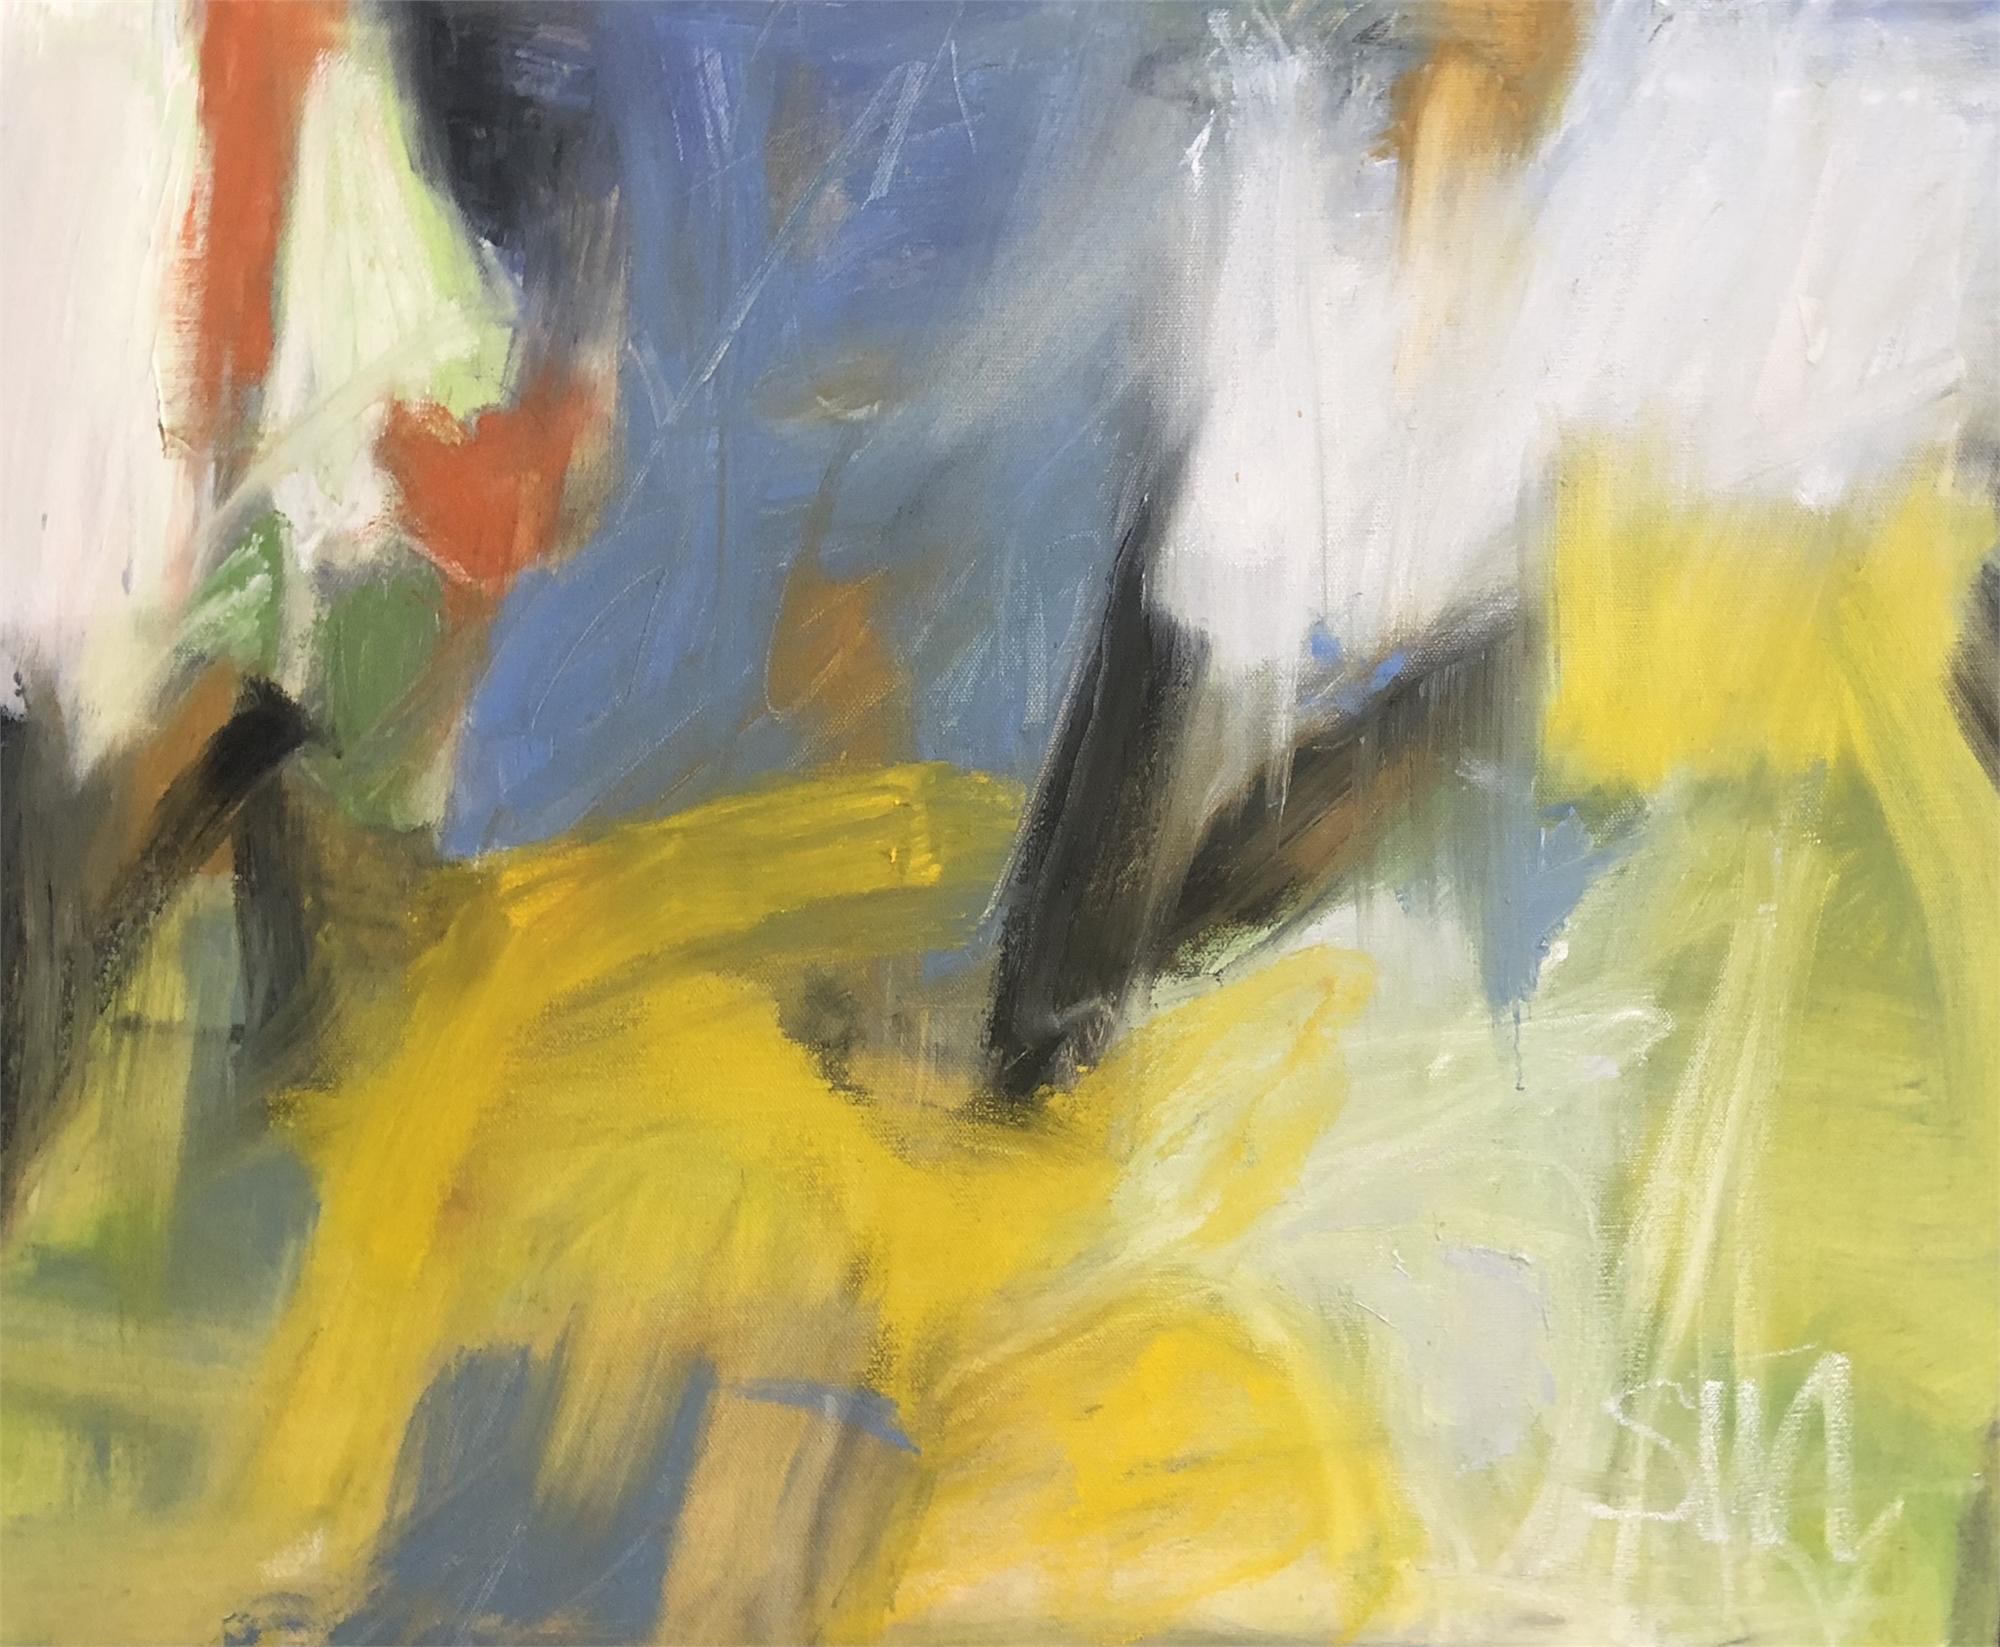 Pleasure by Susan Altman